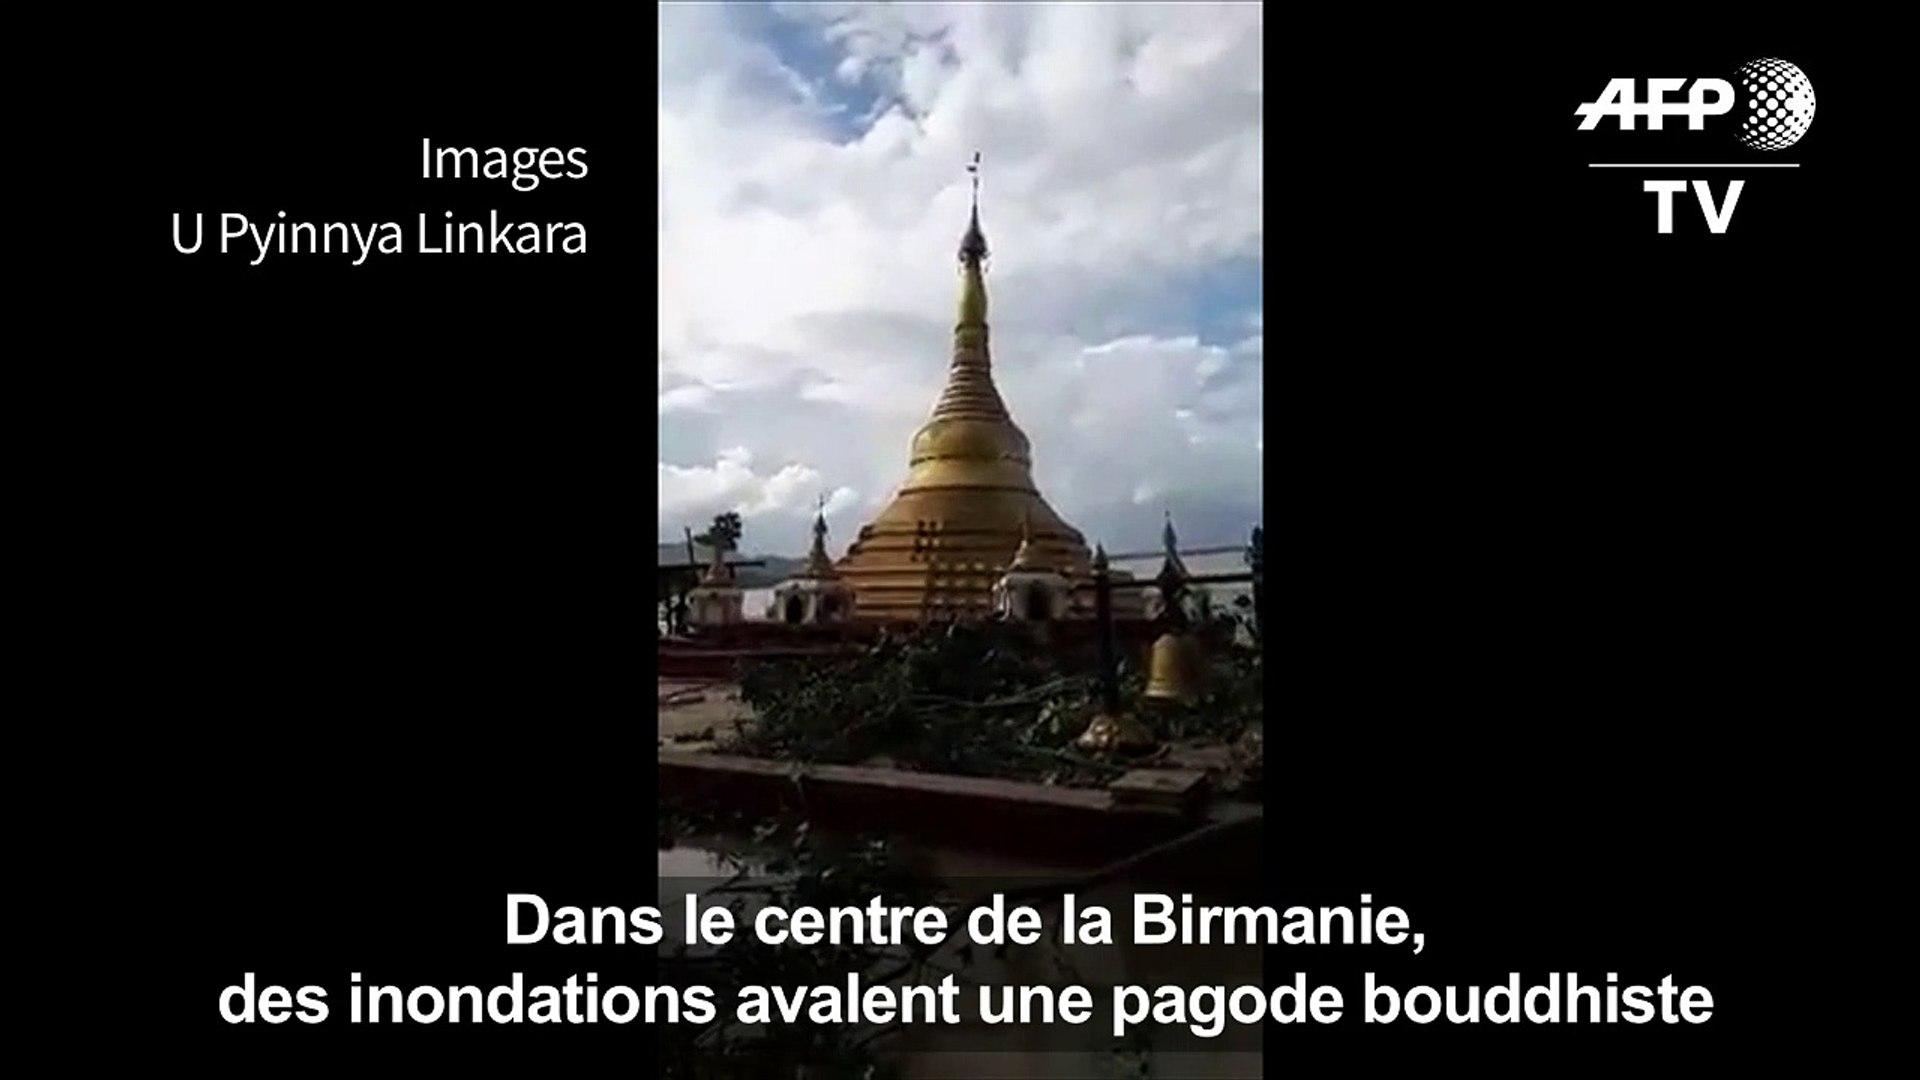 Birmanie: des inondations avalent une pagode